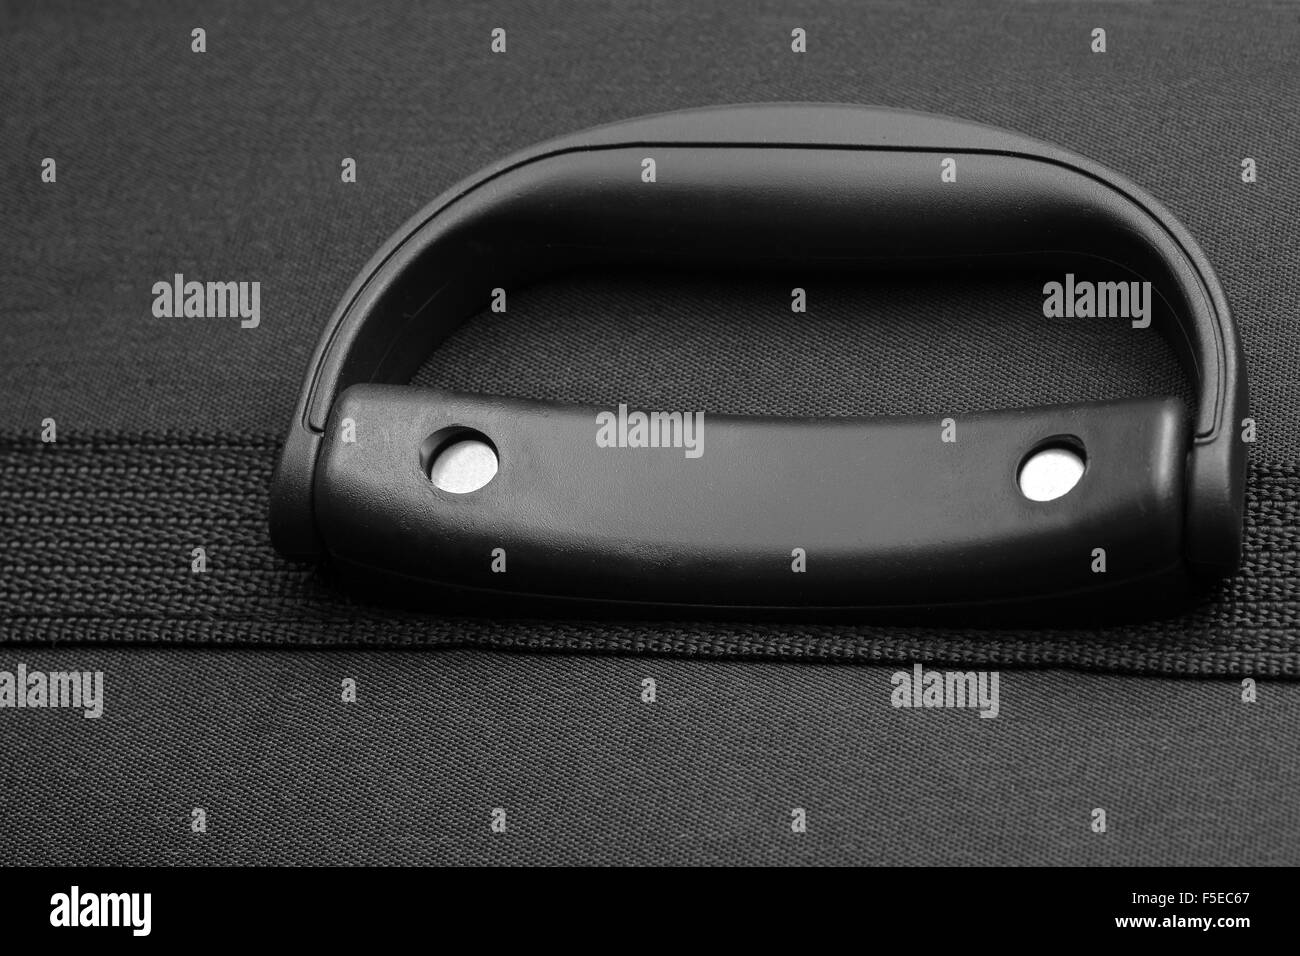 black travel suitcase handle closeup - Stock Image